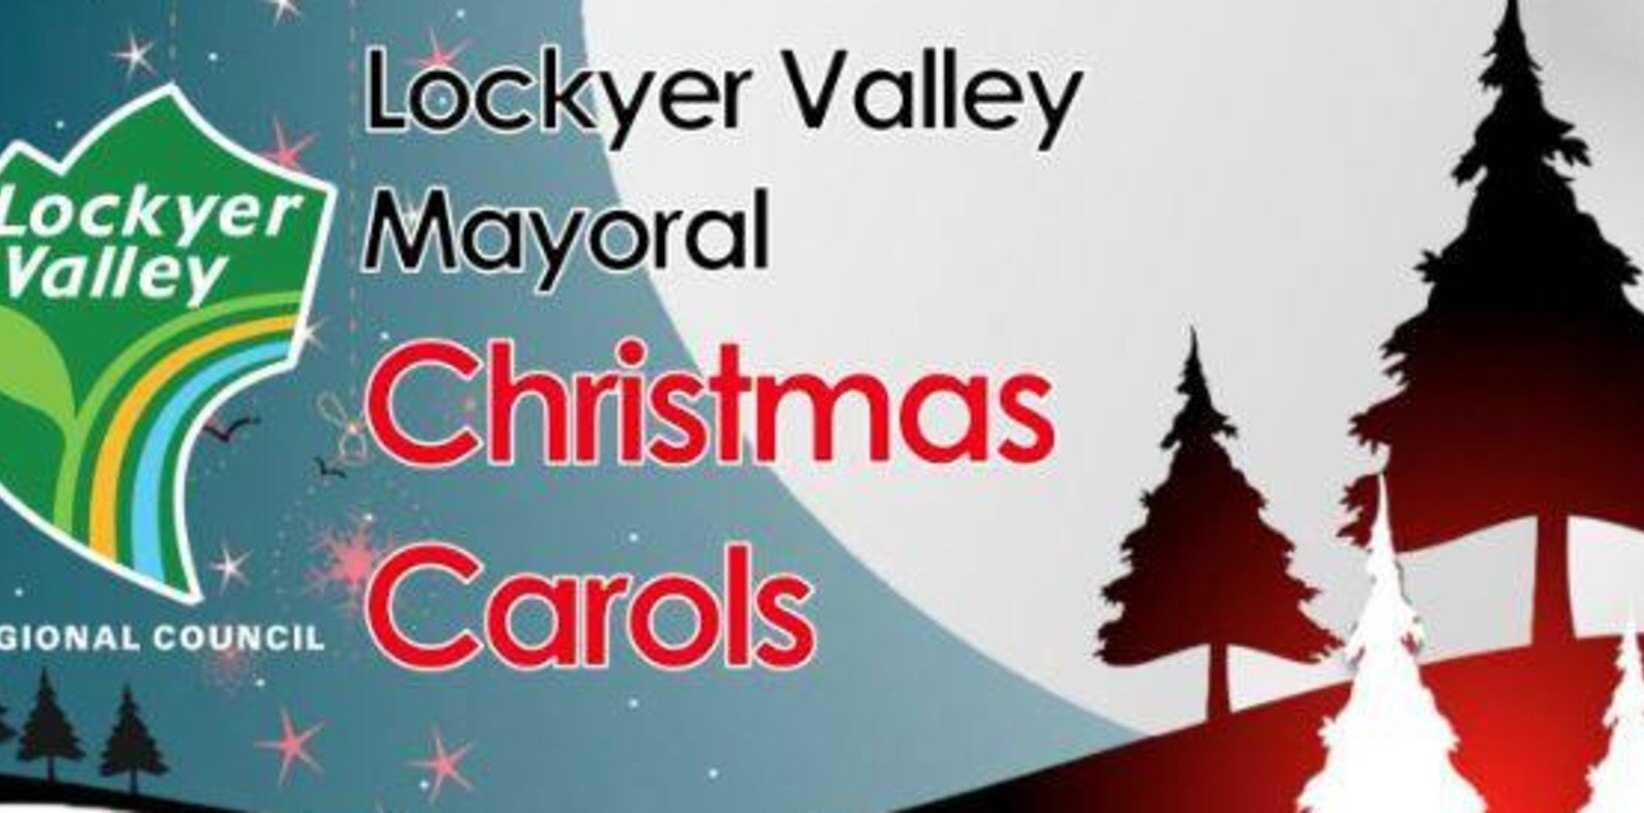 Mayoral Christmas Carols. Copyright Lockyer Valley Regional Council